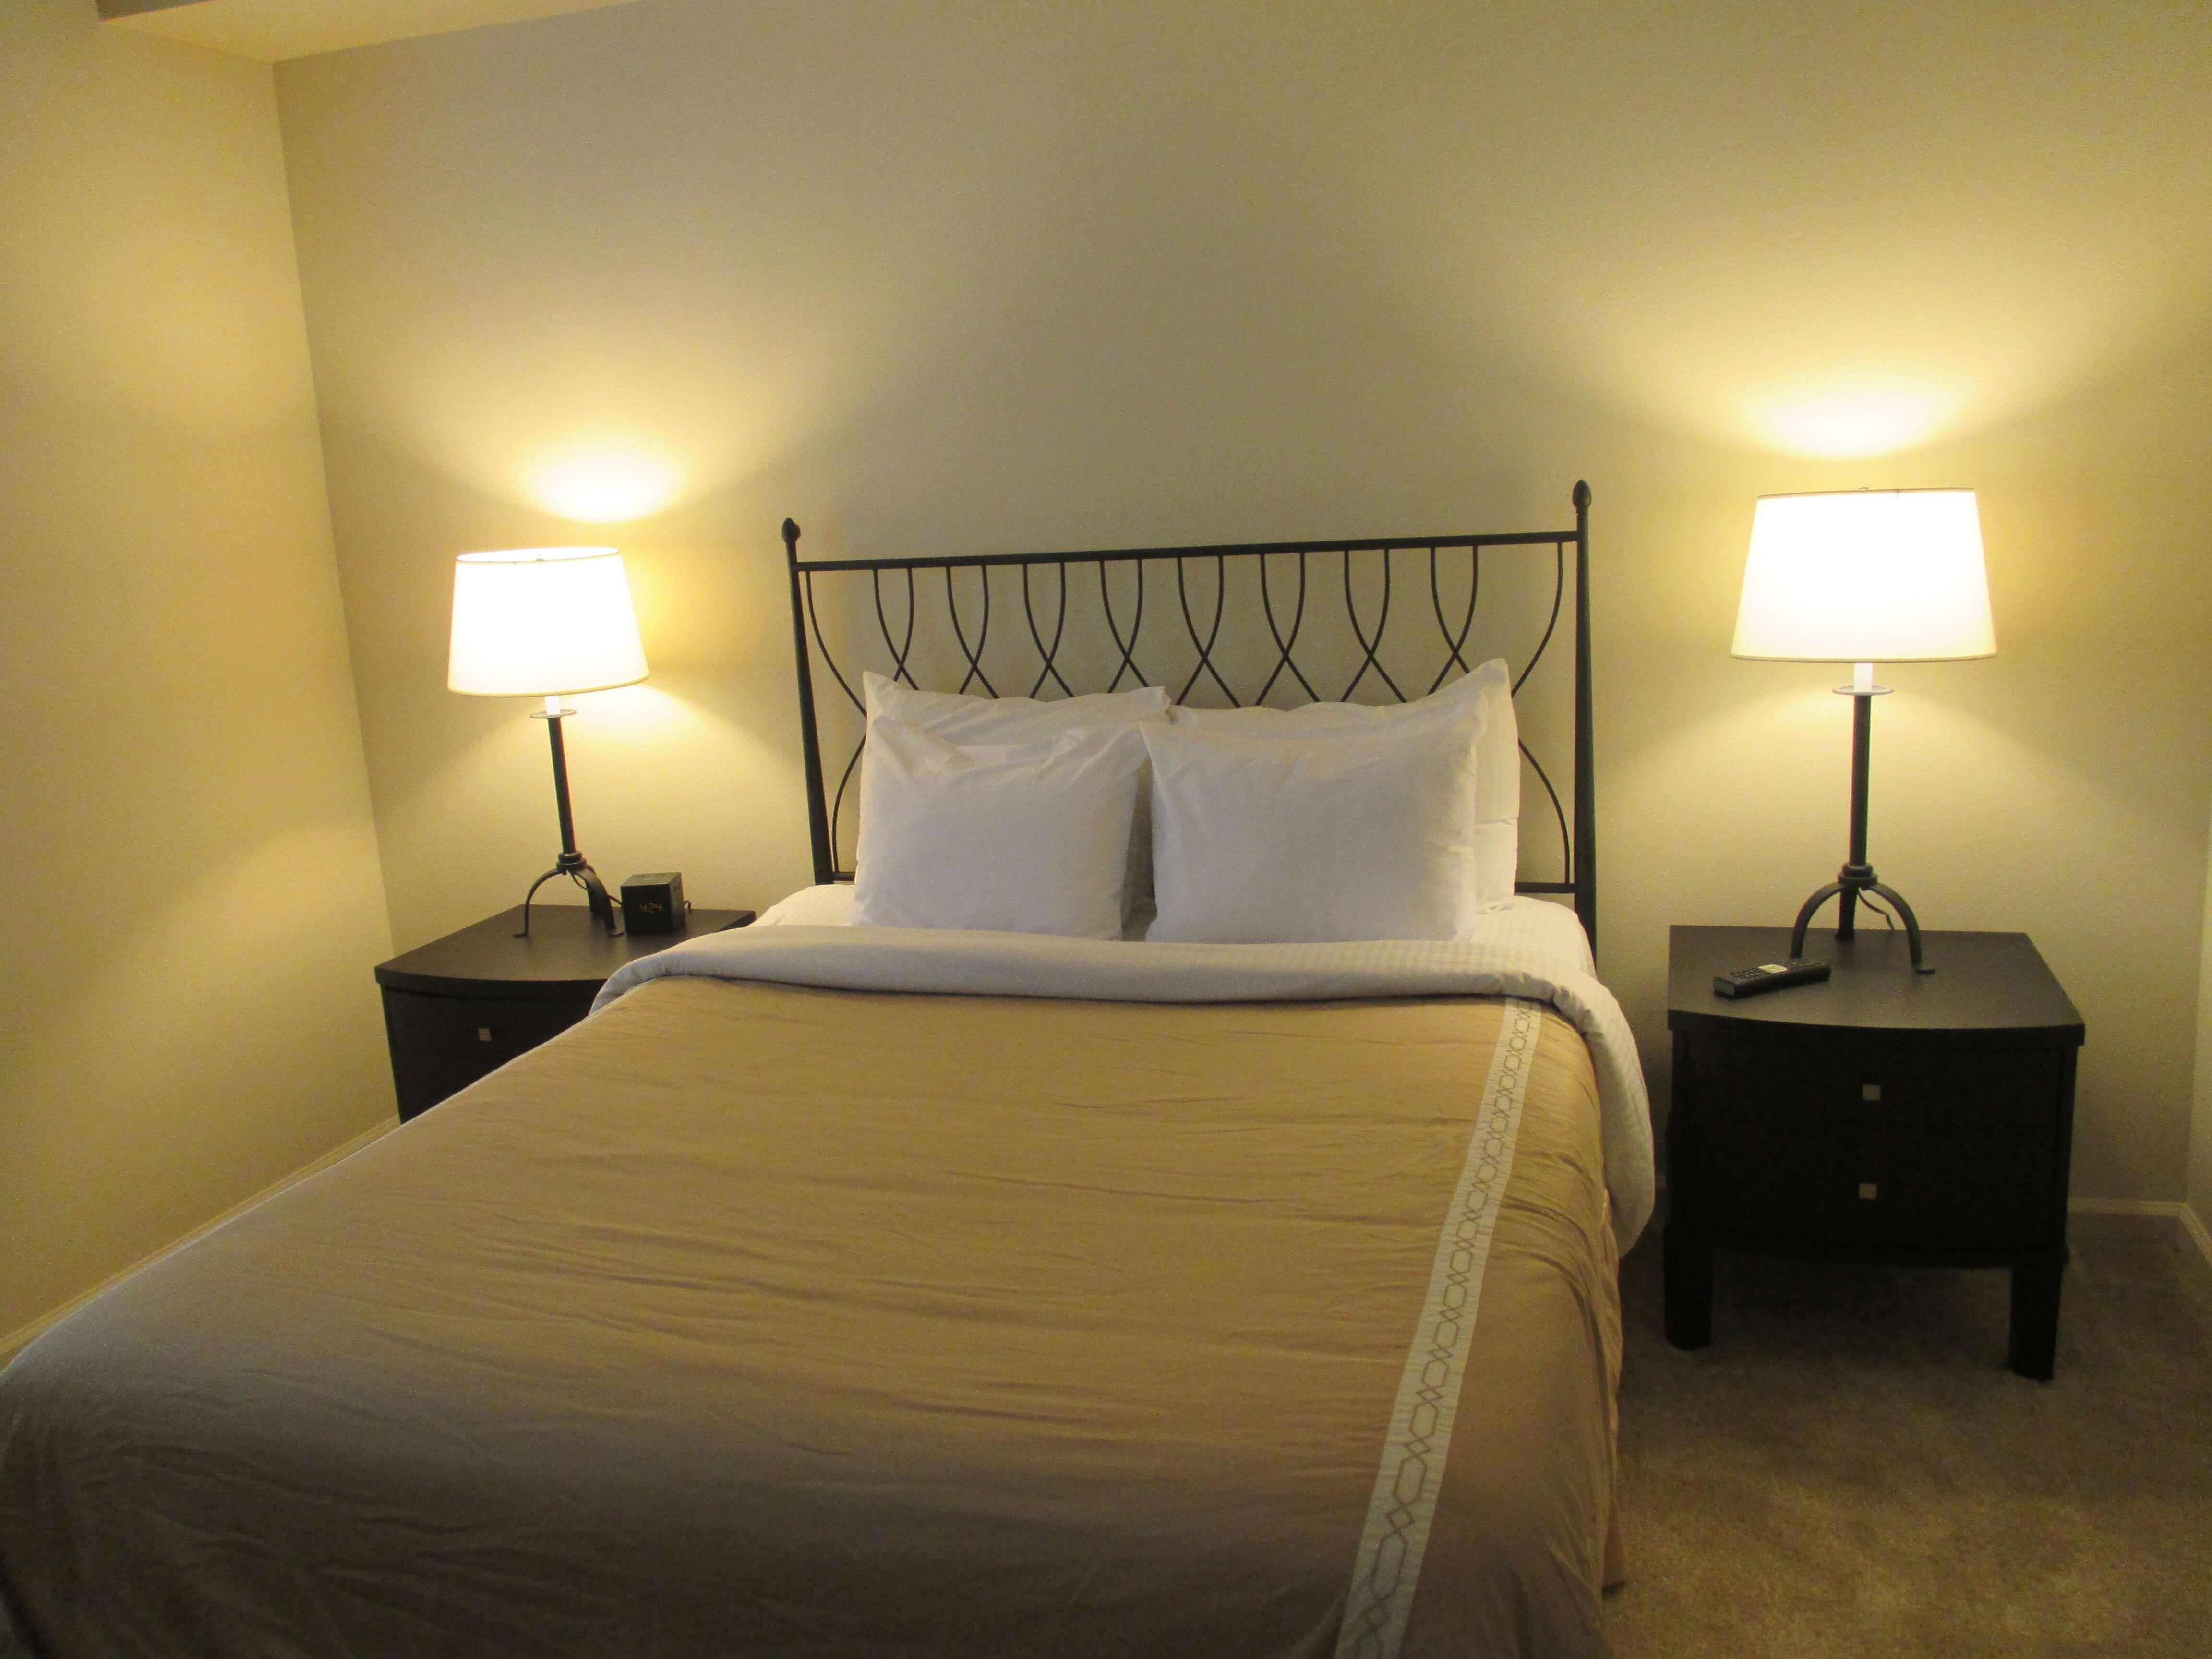 image 5 furnished 2 bedroom Apartment for rent in Santa Clara, Santa Clara County